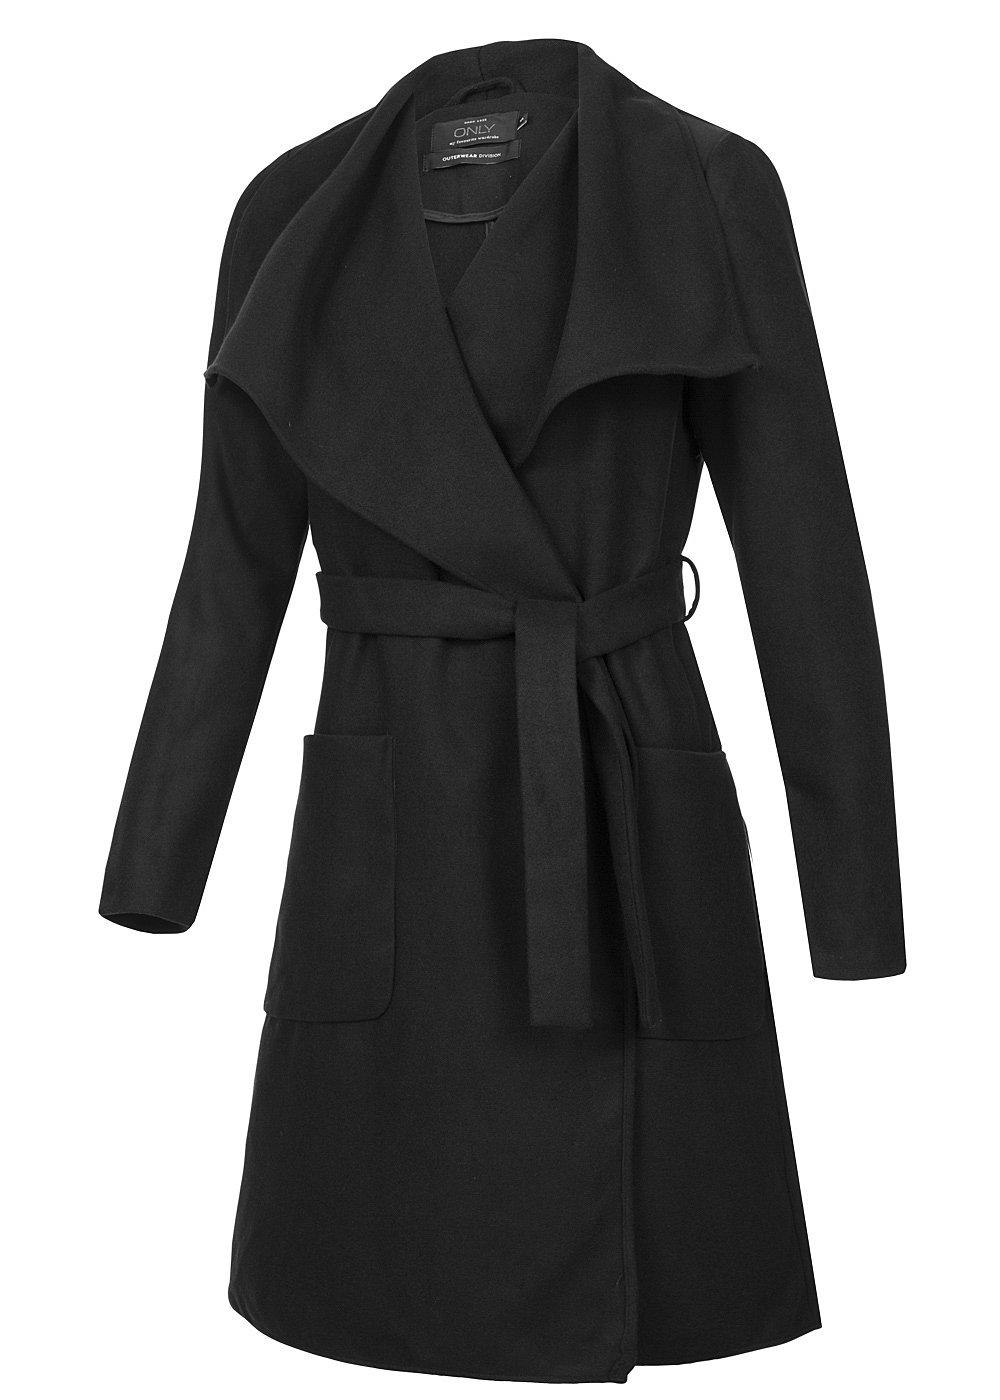 only damen trenchcoat lang phoebe 15109414 breiter kragen bindeg rtel schwarz 77onlineshop. Black Bedroom Furniture Sets. Home Design Ideas